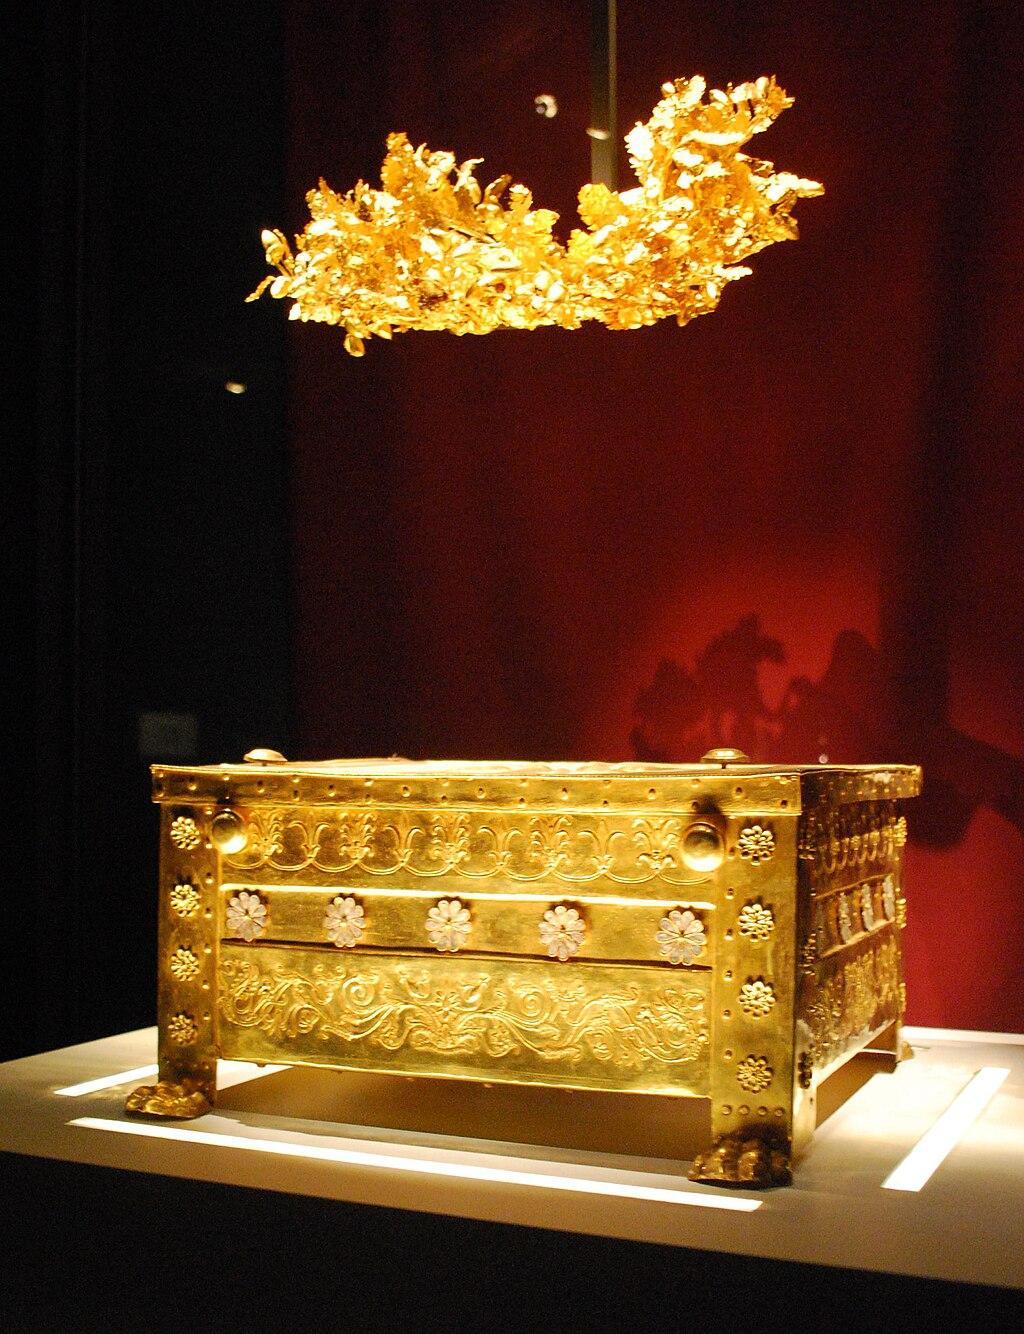 Philip II larnax vergina greece